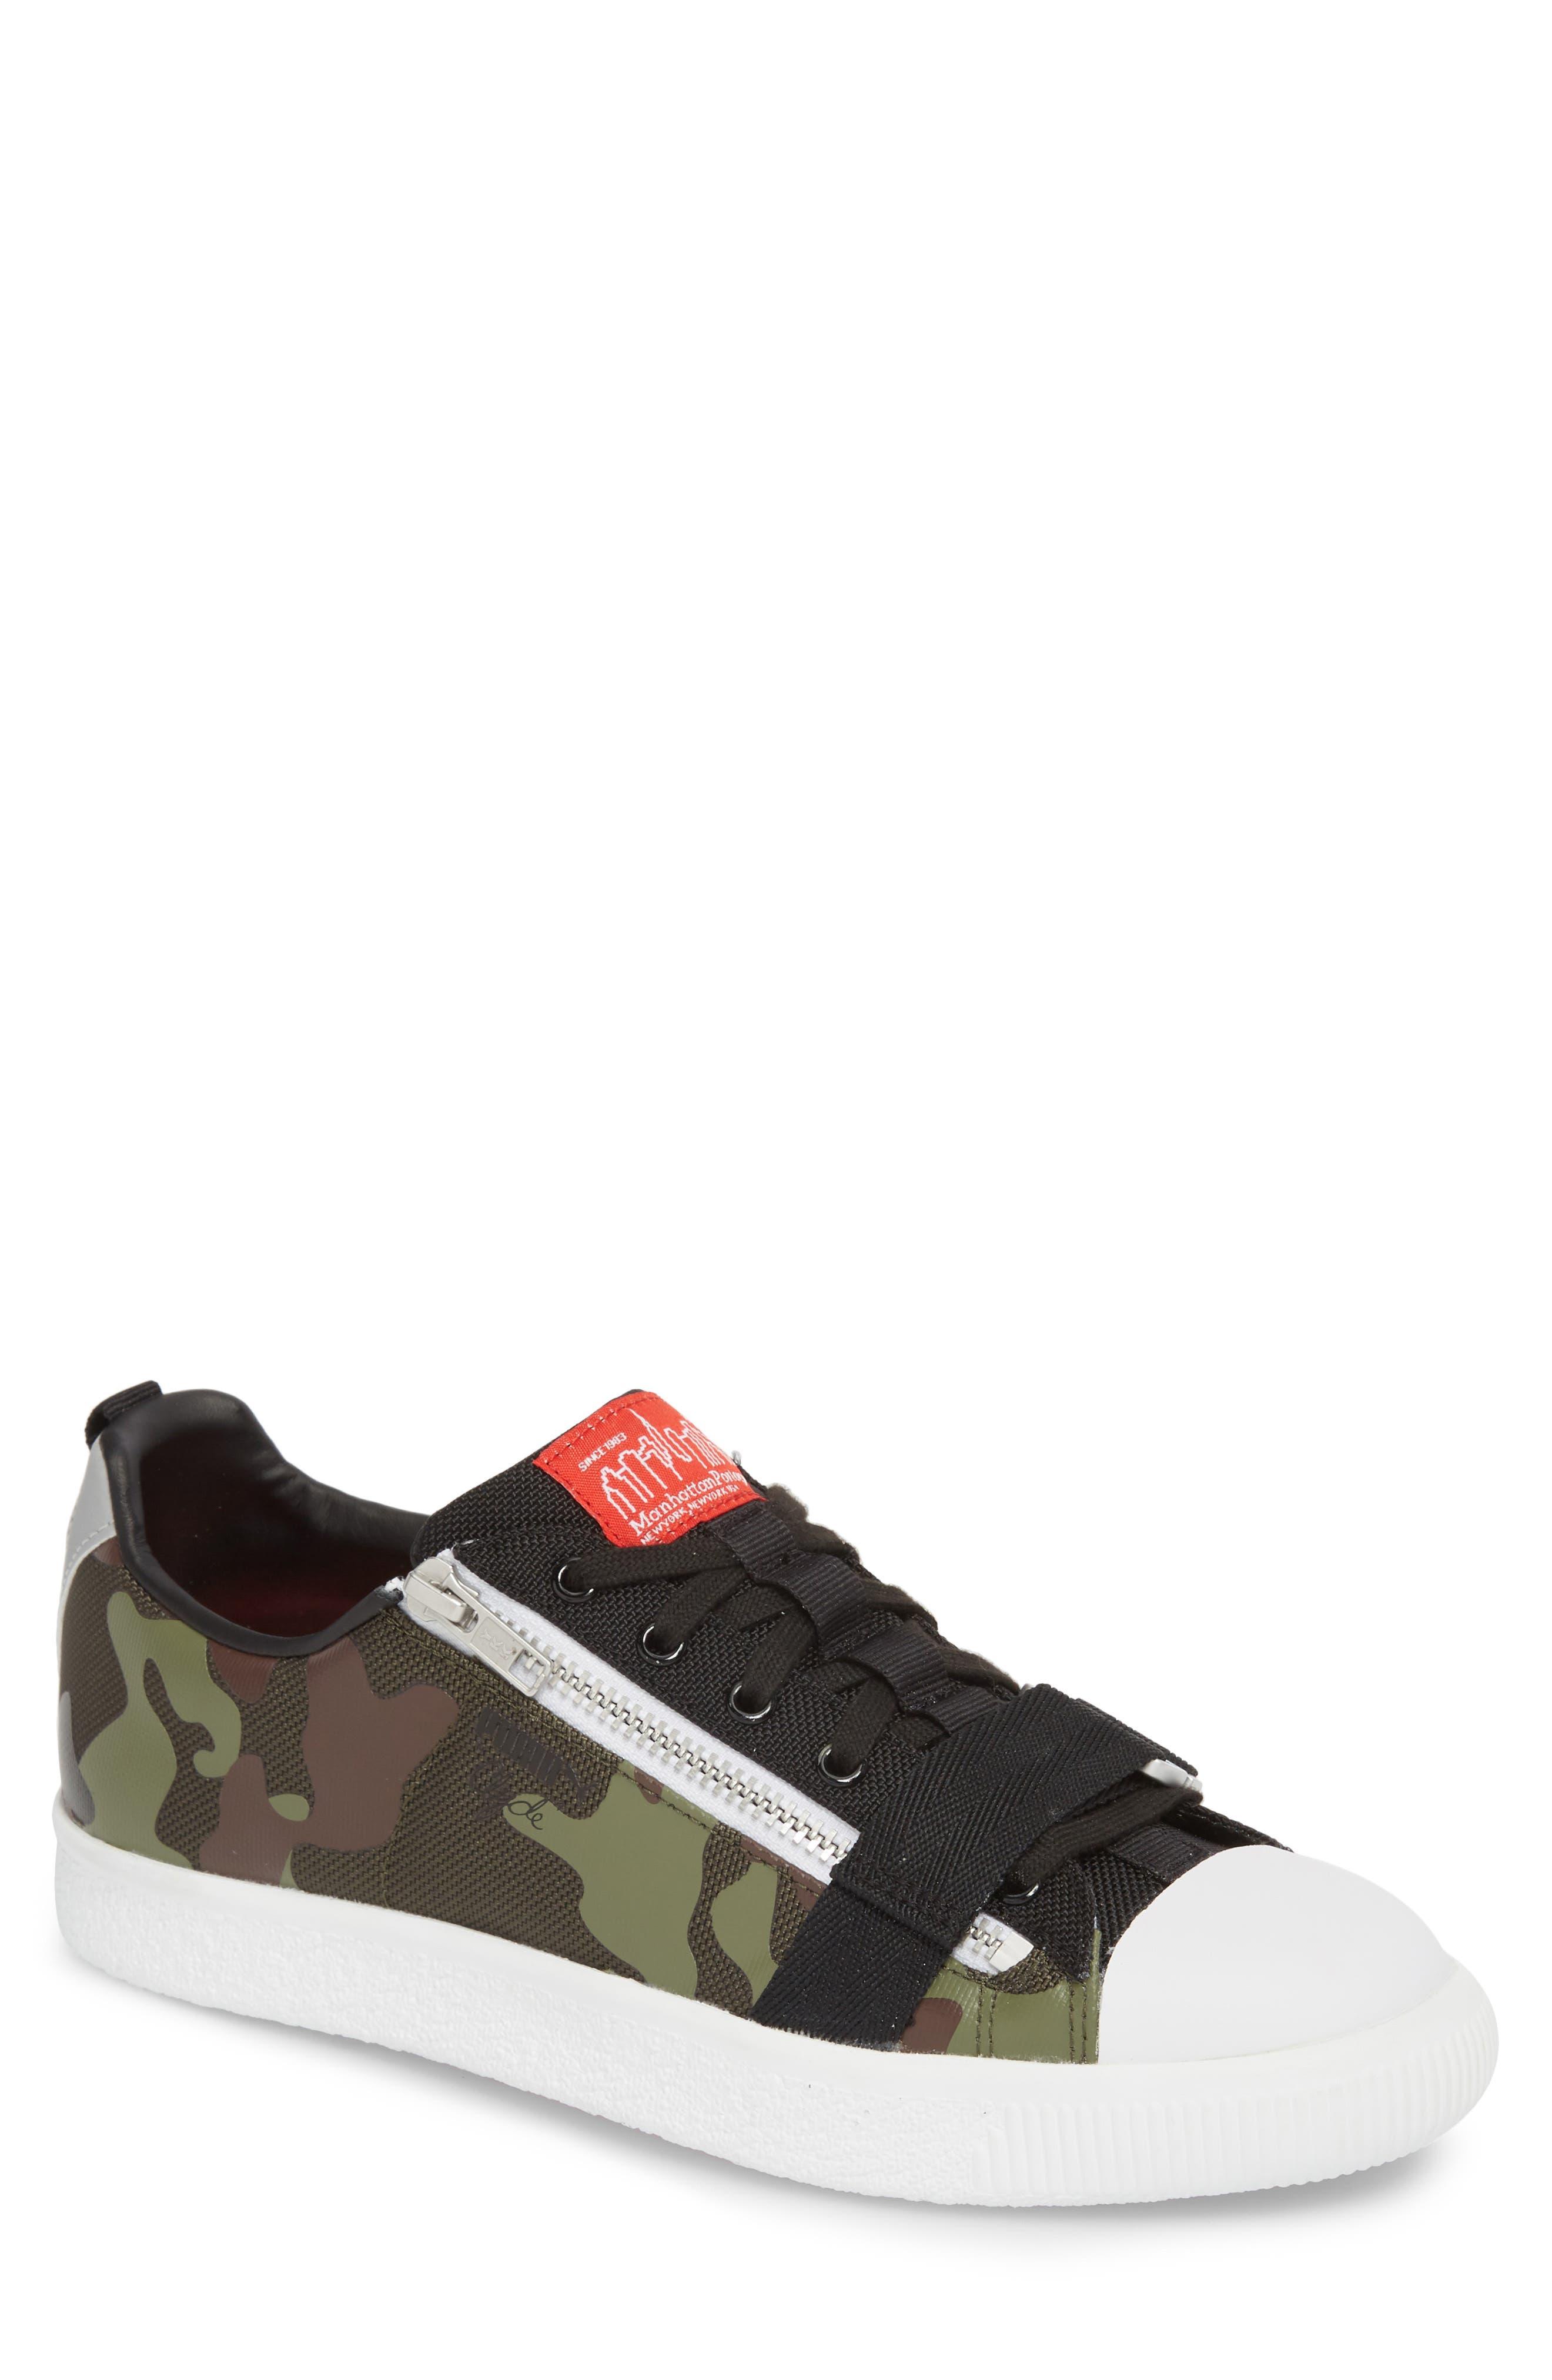 x MANHATTAN PORTAGE Clyde Zip Sneaker,                             Main thumbnail 1, color,                             300